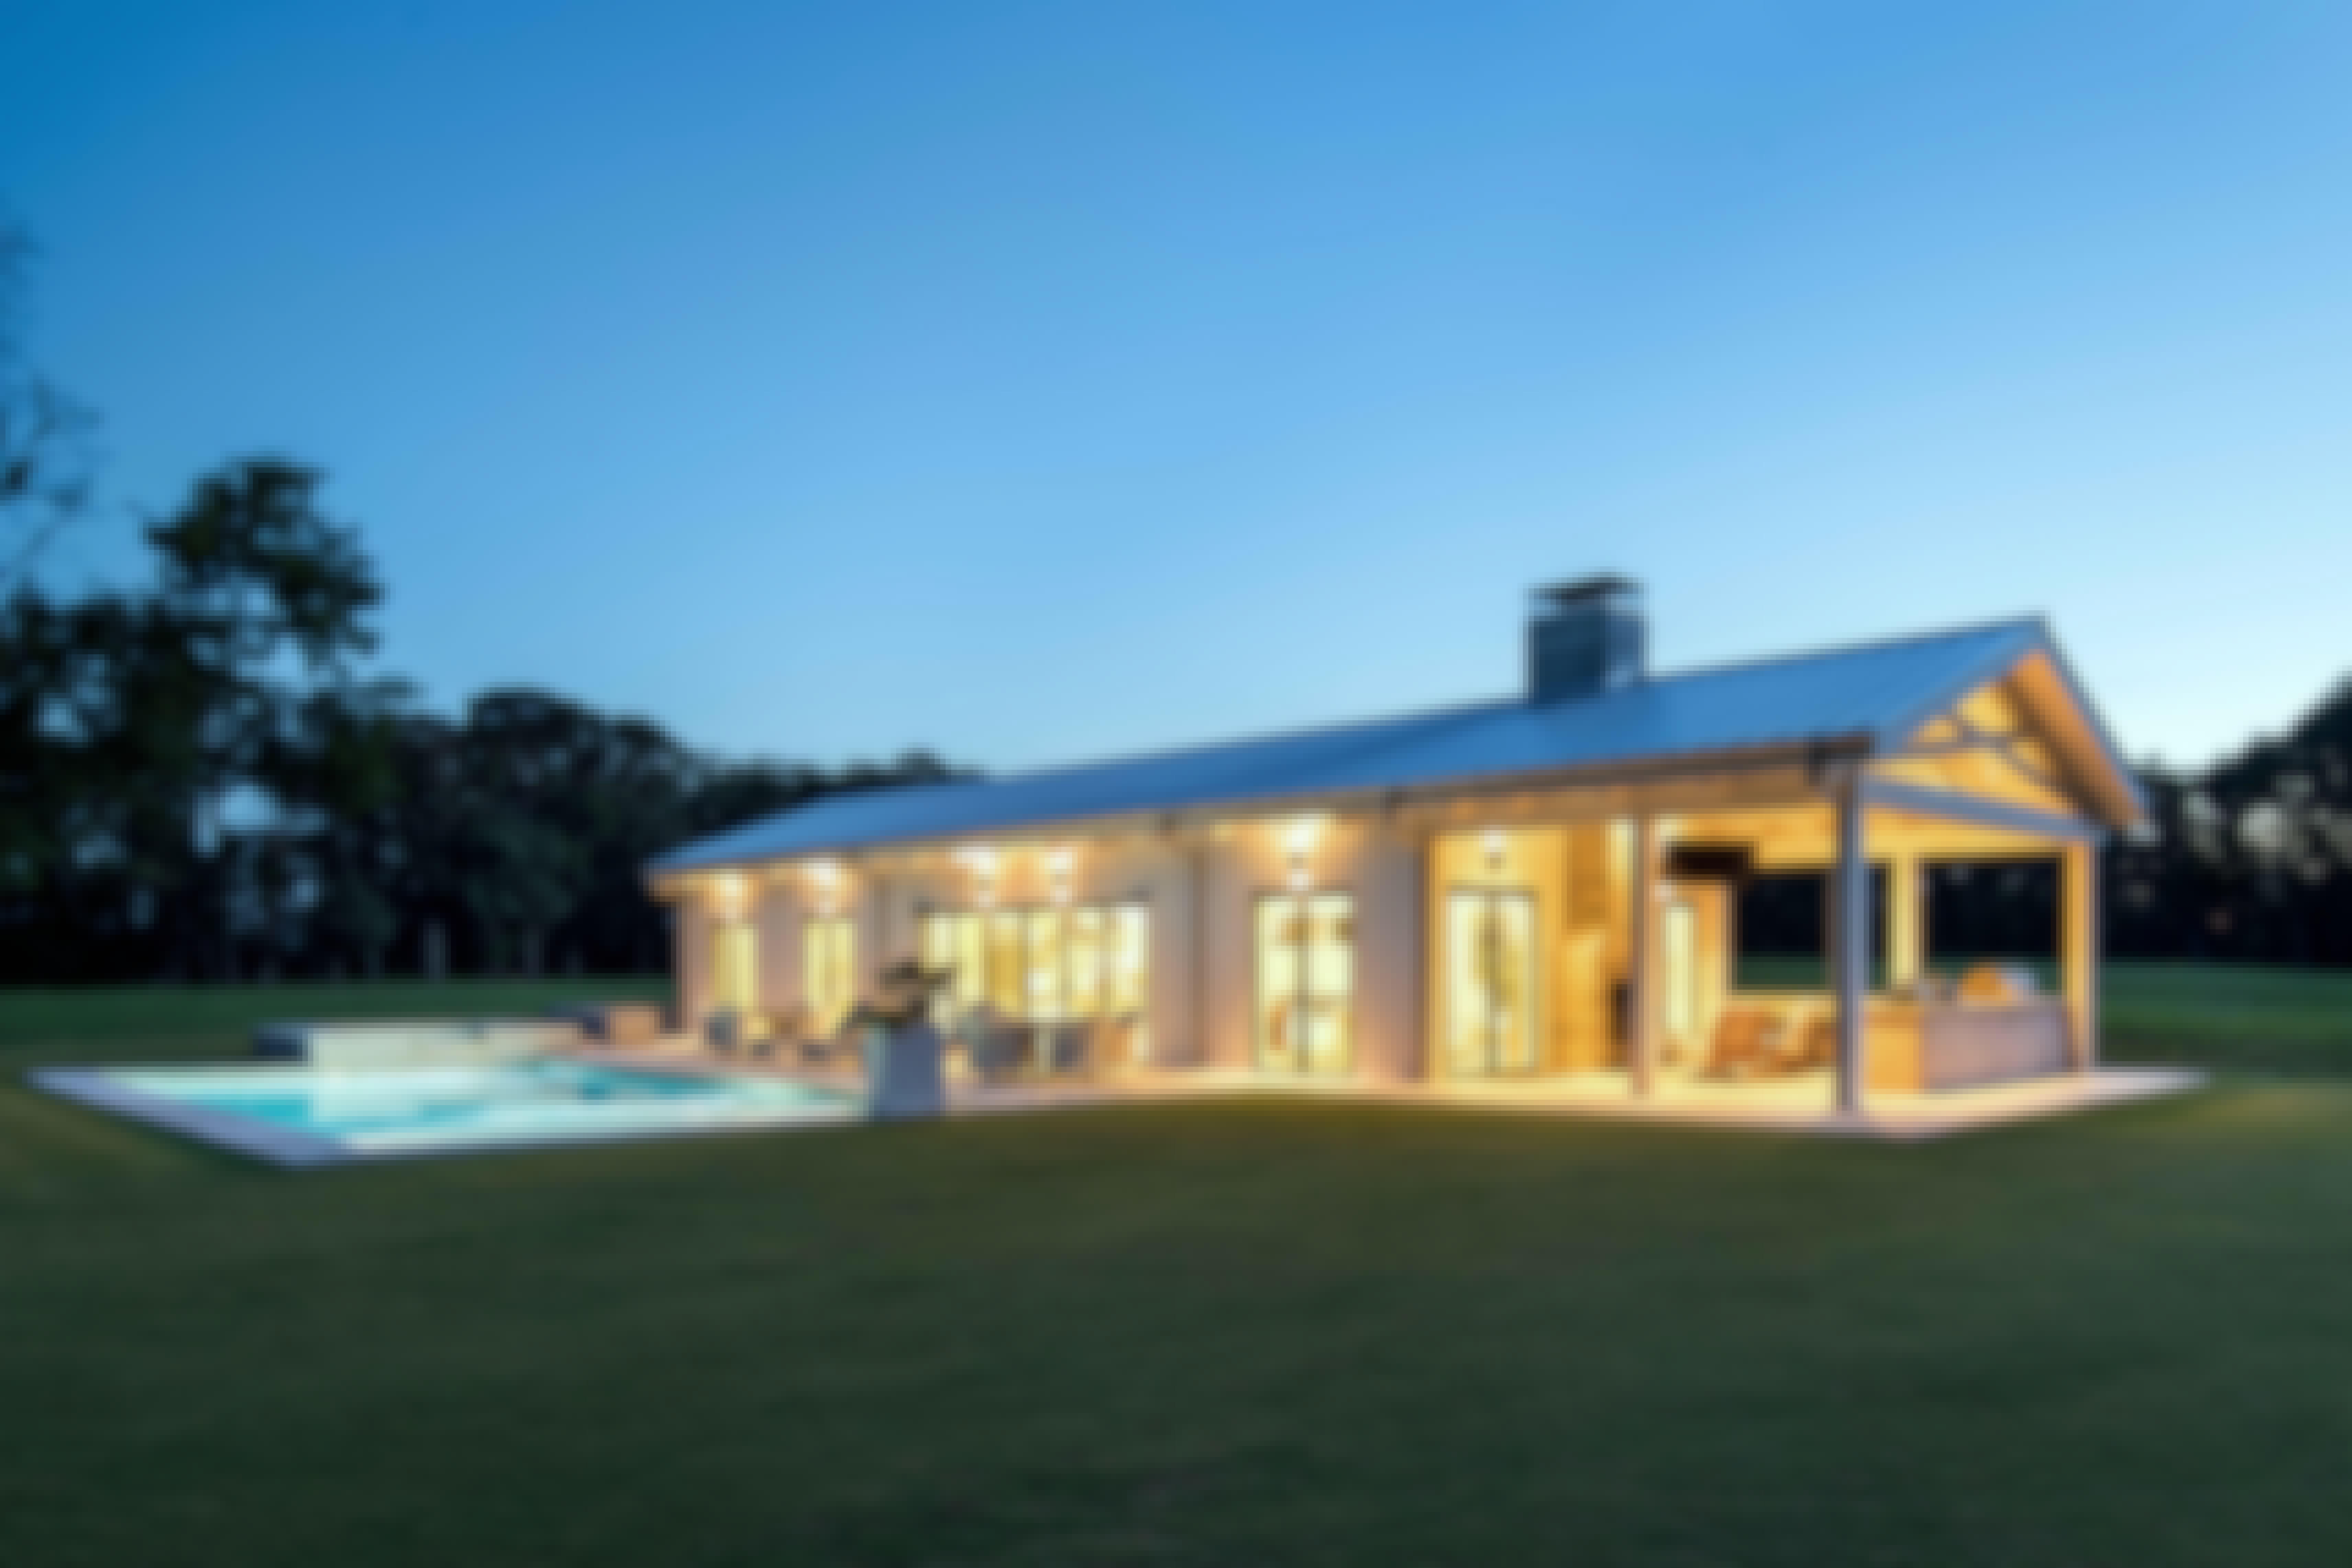 illuminated-pool-house-with-NanaWall-folding-glass-walls